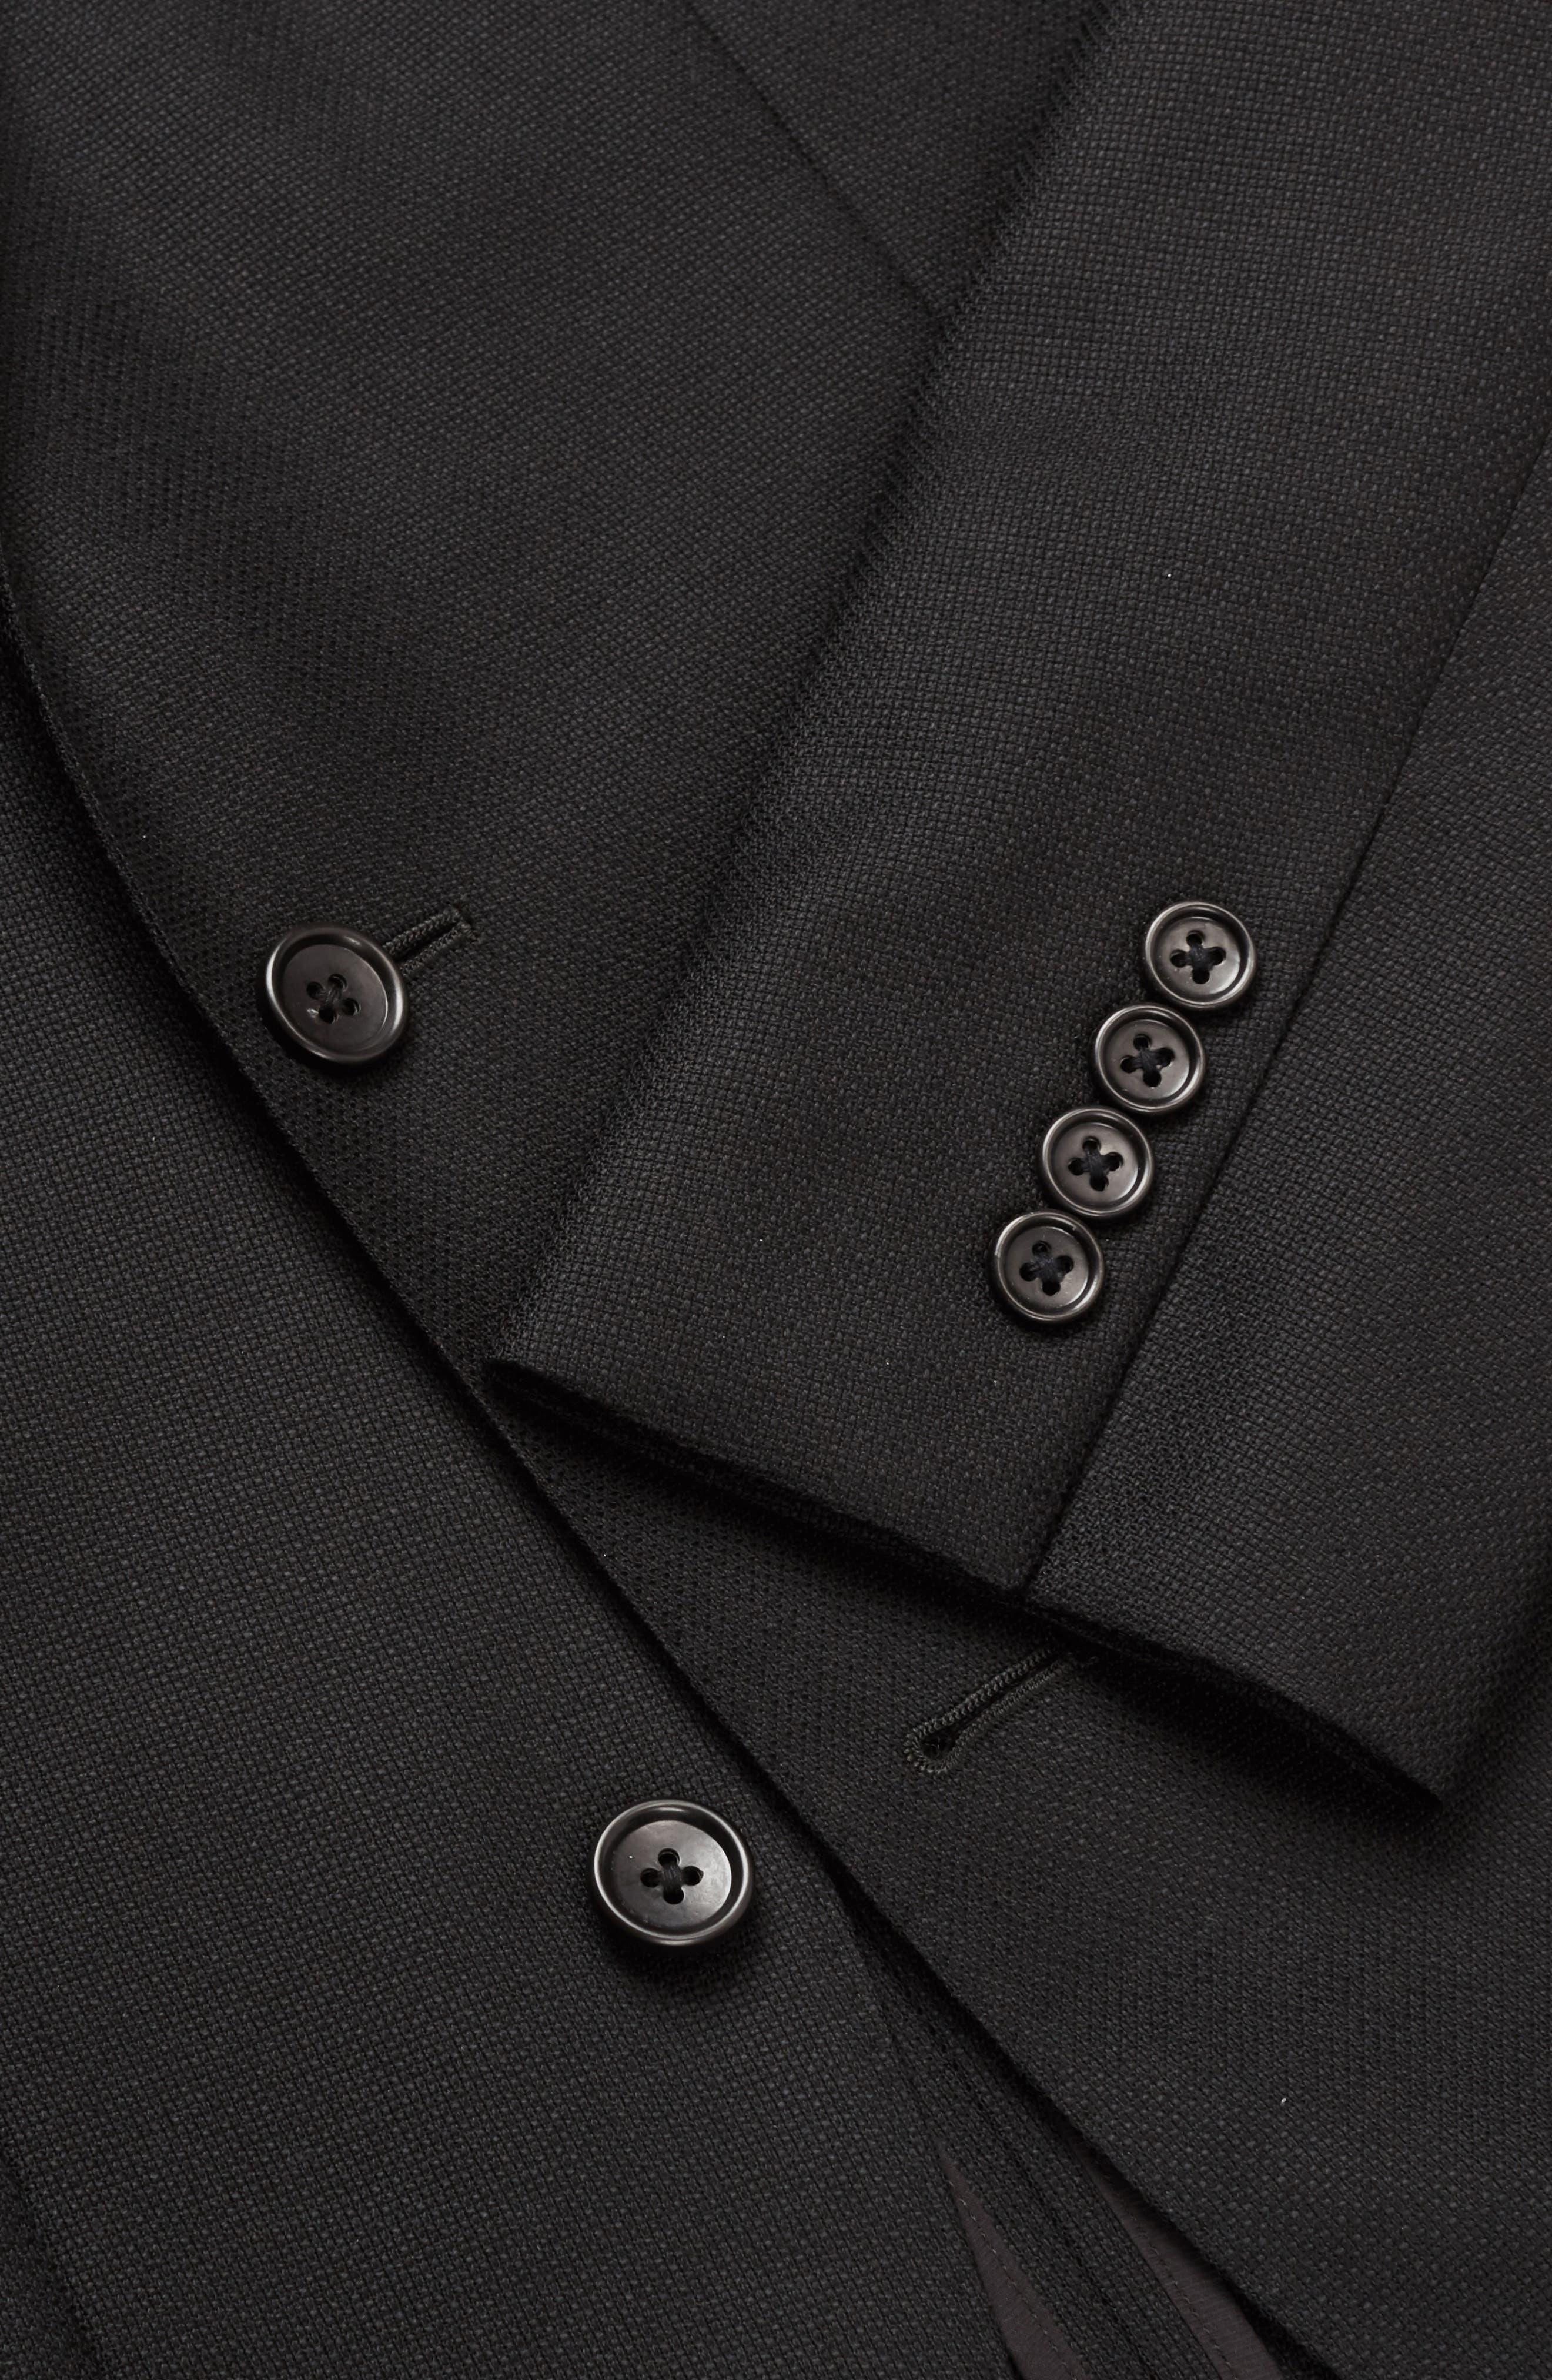 Wool Unconstructed Sport Coat,                             Alternate thumbnail 3, color,                             Black